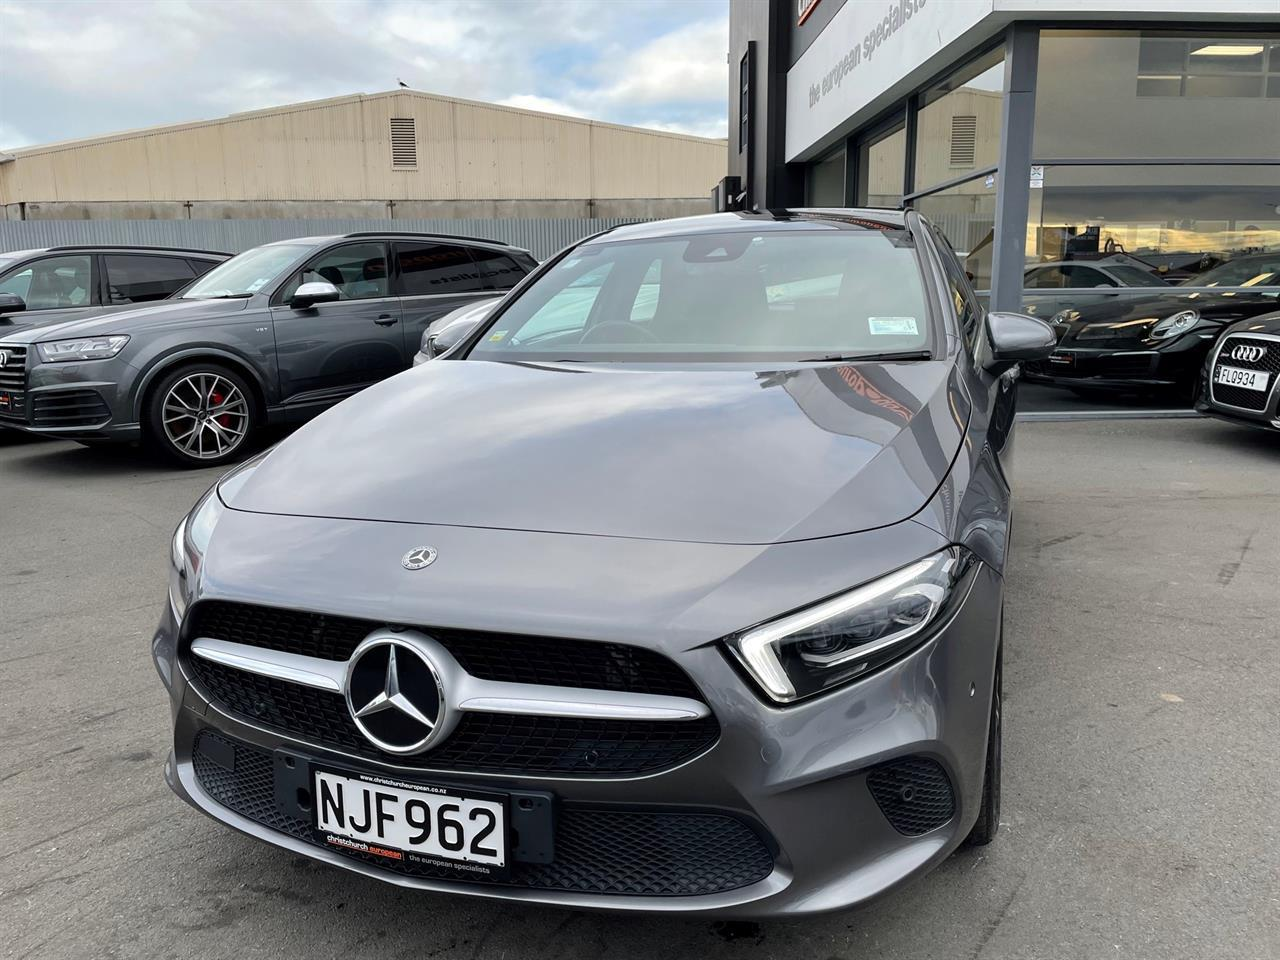 image-7, 2019 MercedesBenz A180 1.3T 7 Speed New Model at Christchurch